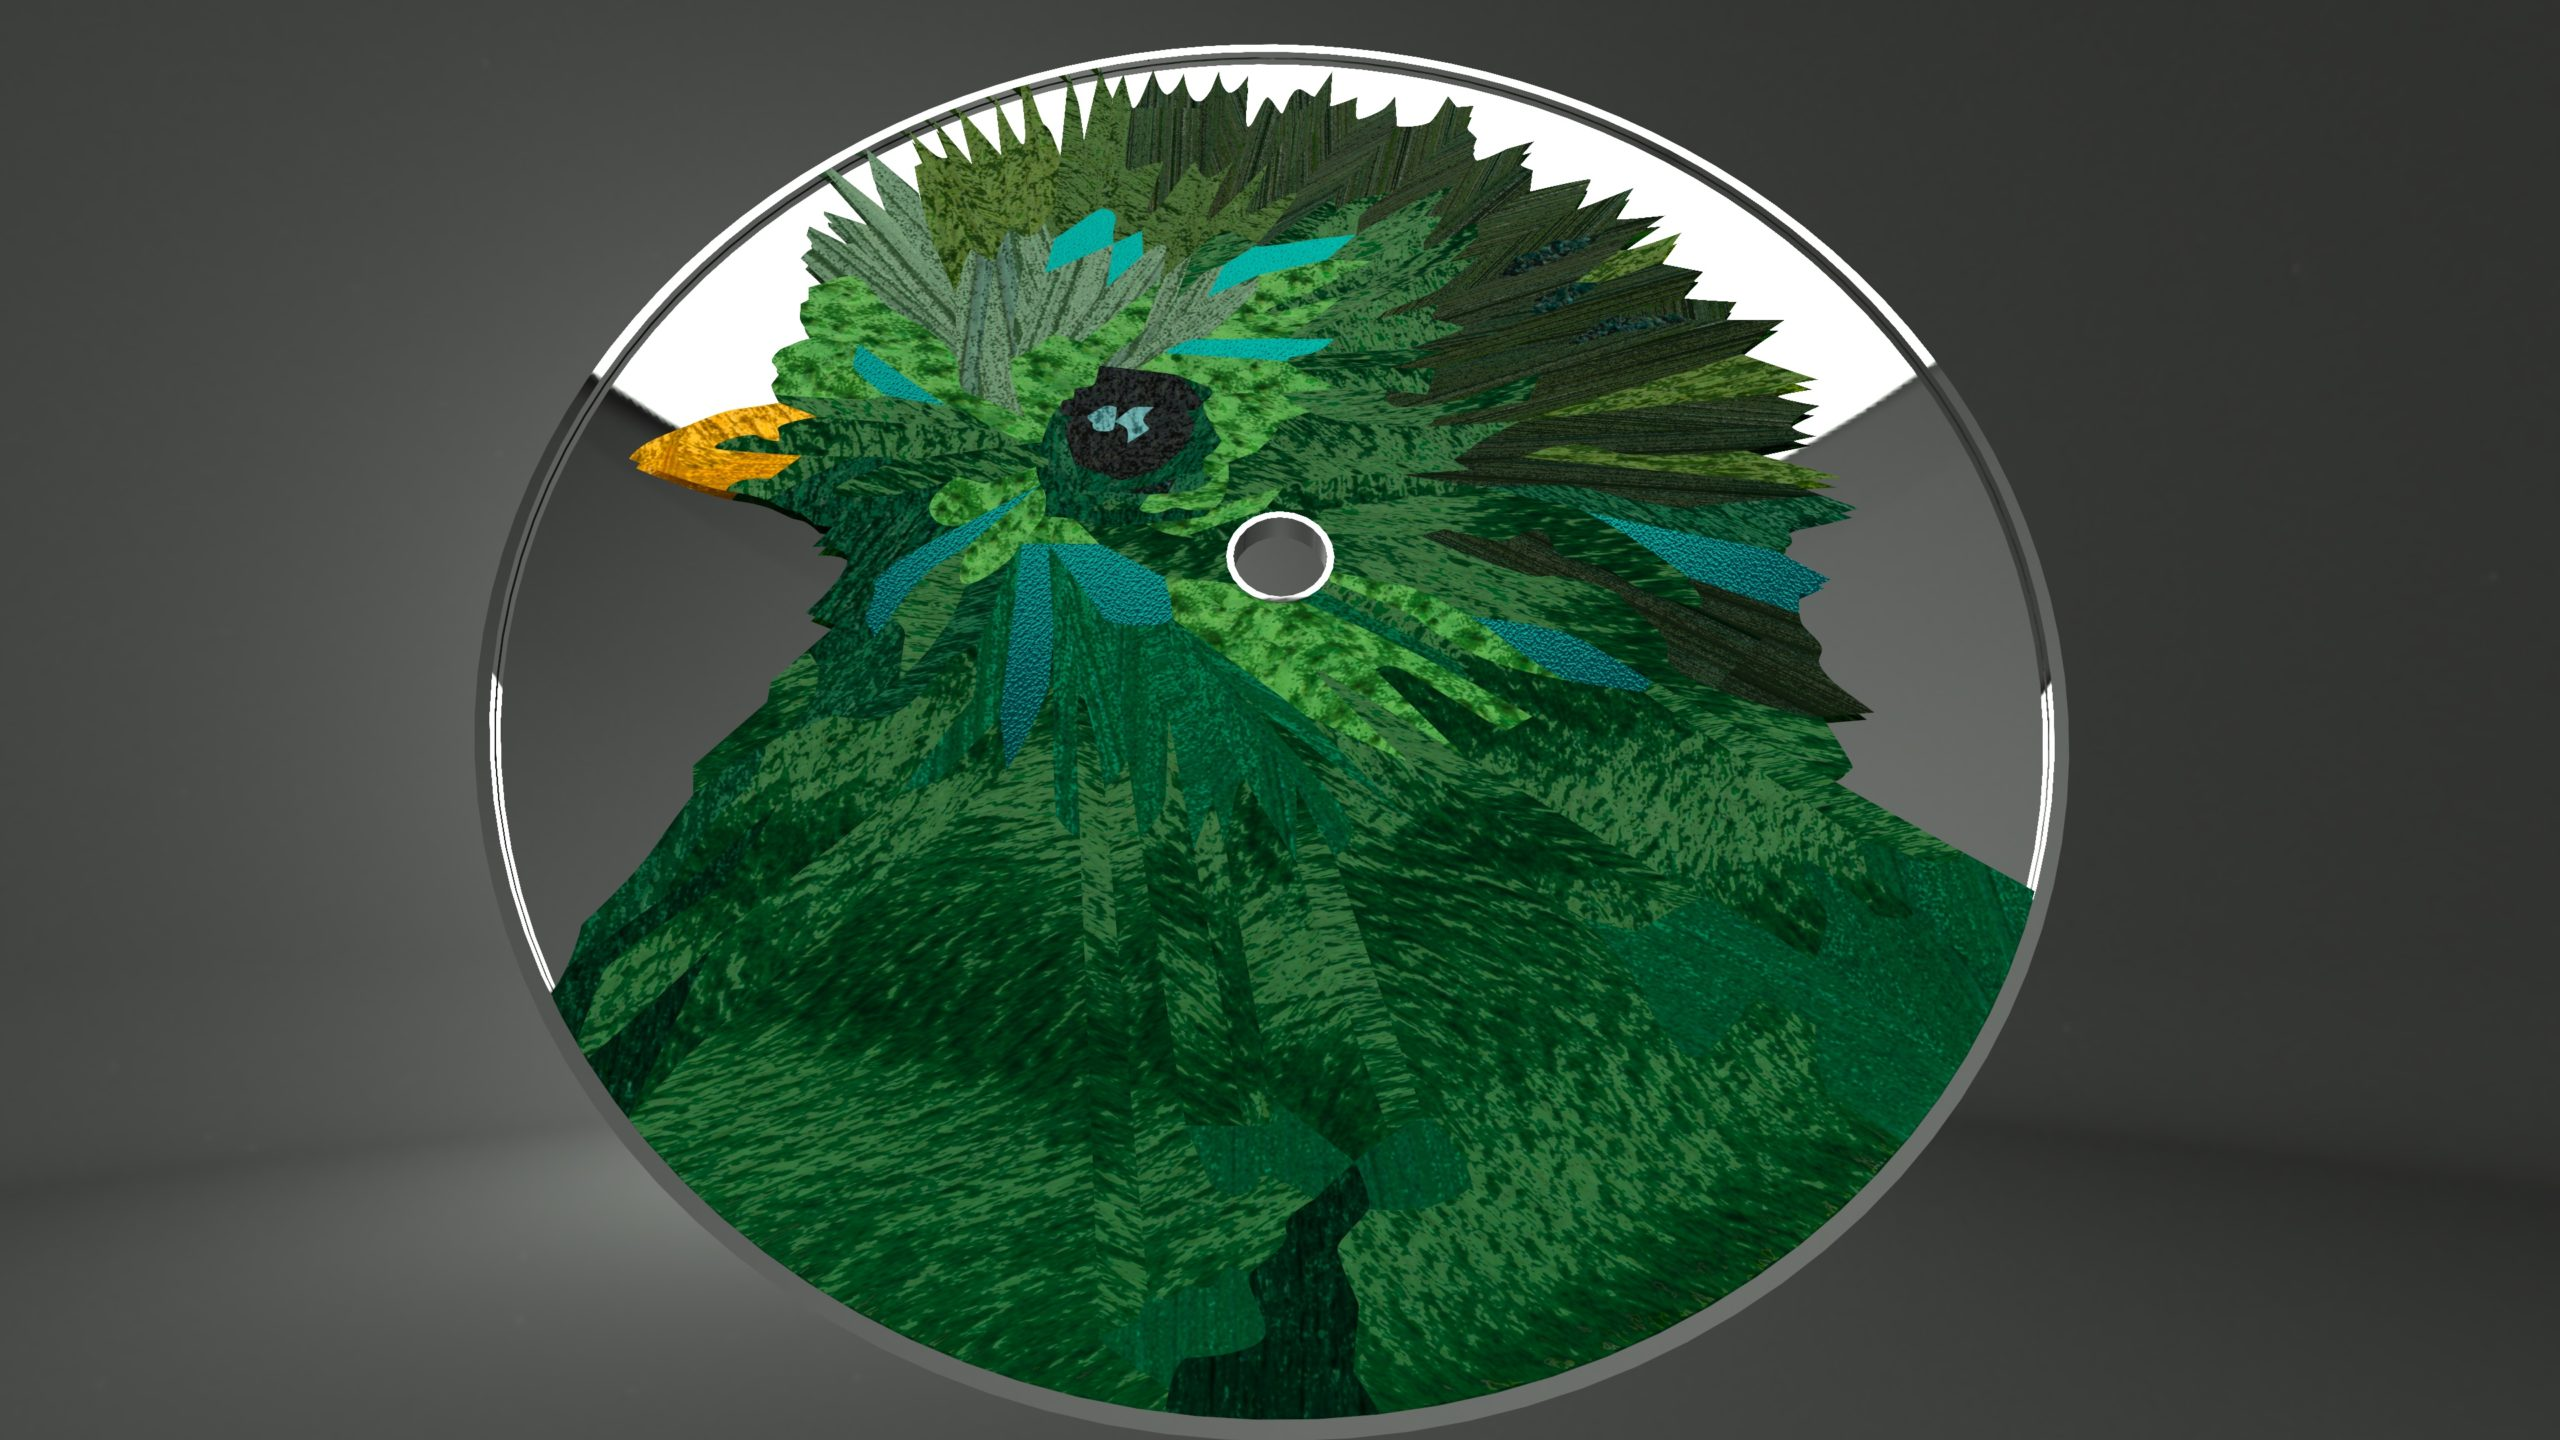 Quetzal_34-scaled.jpg